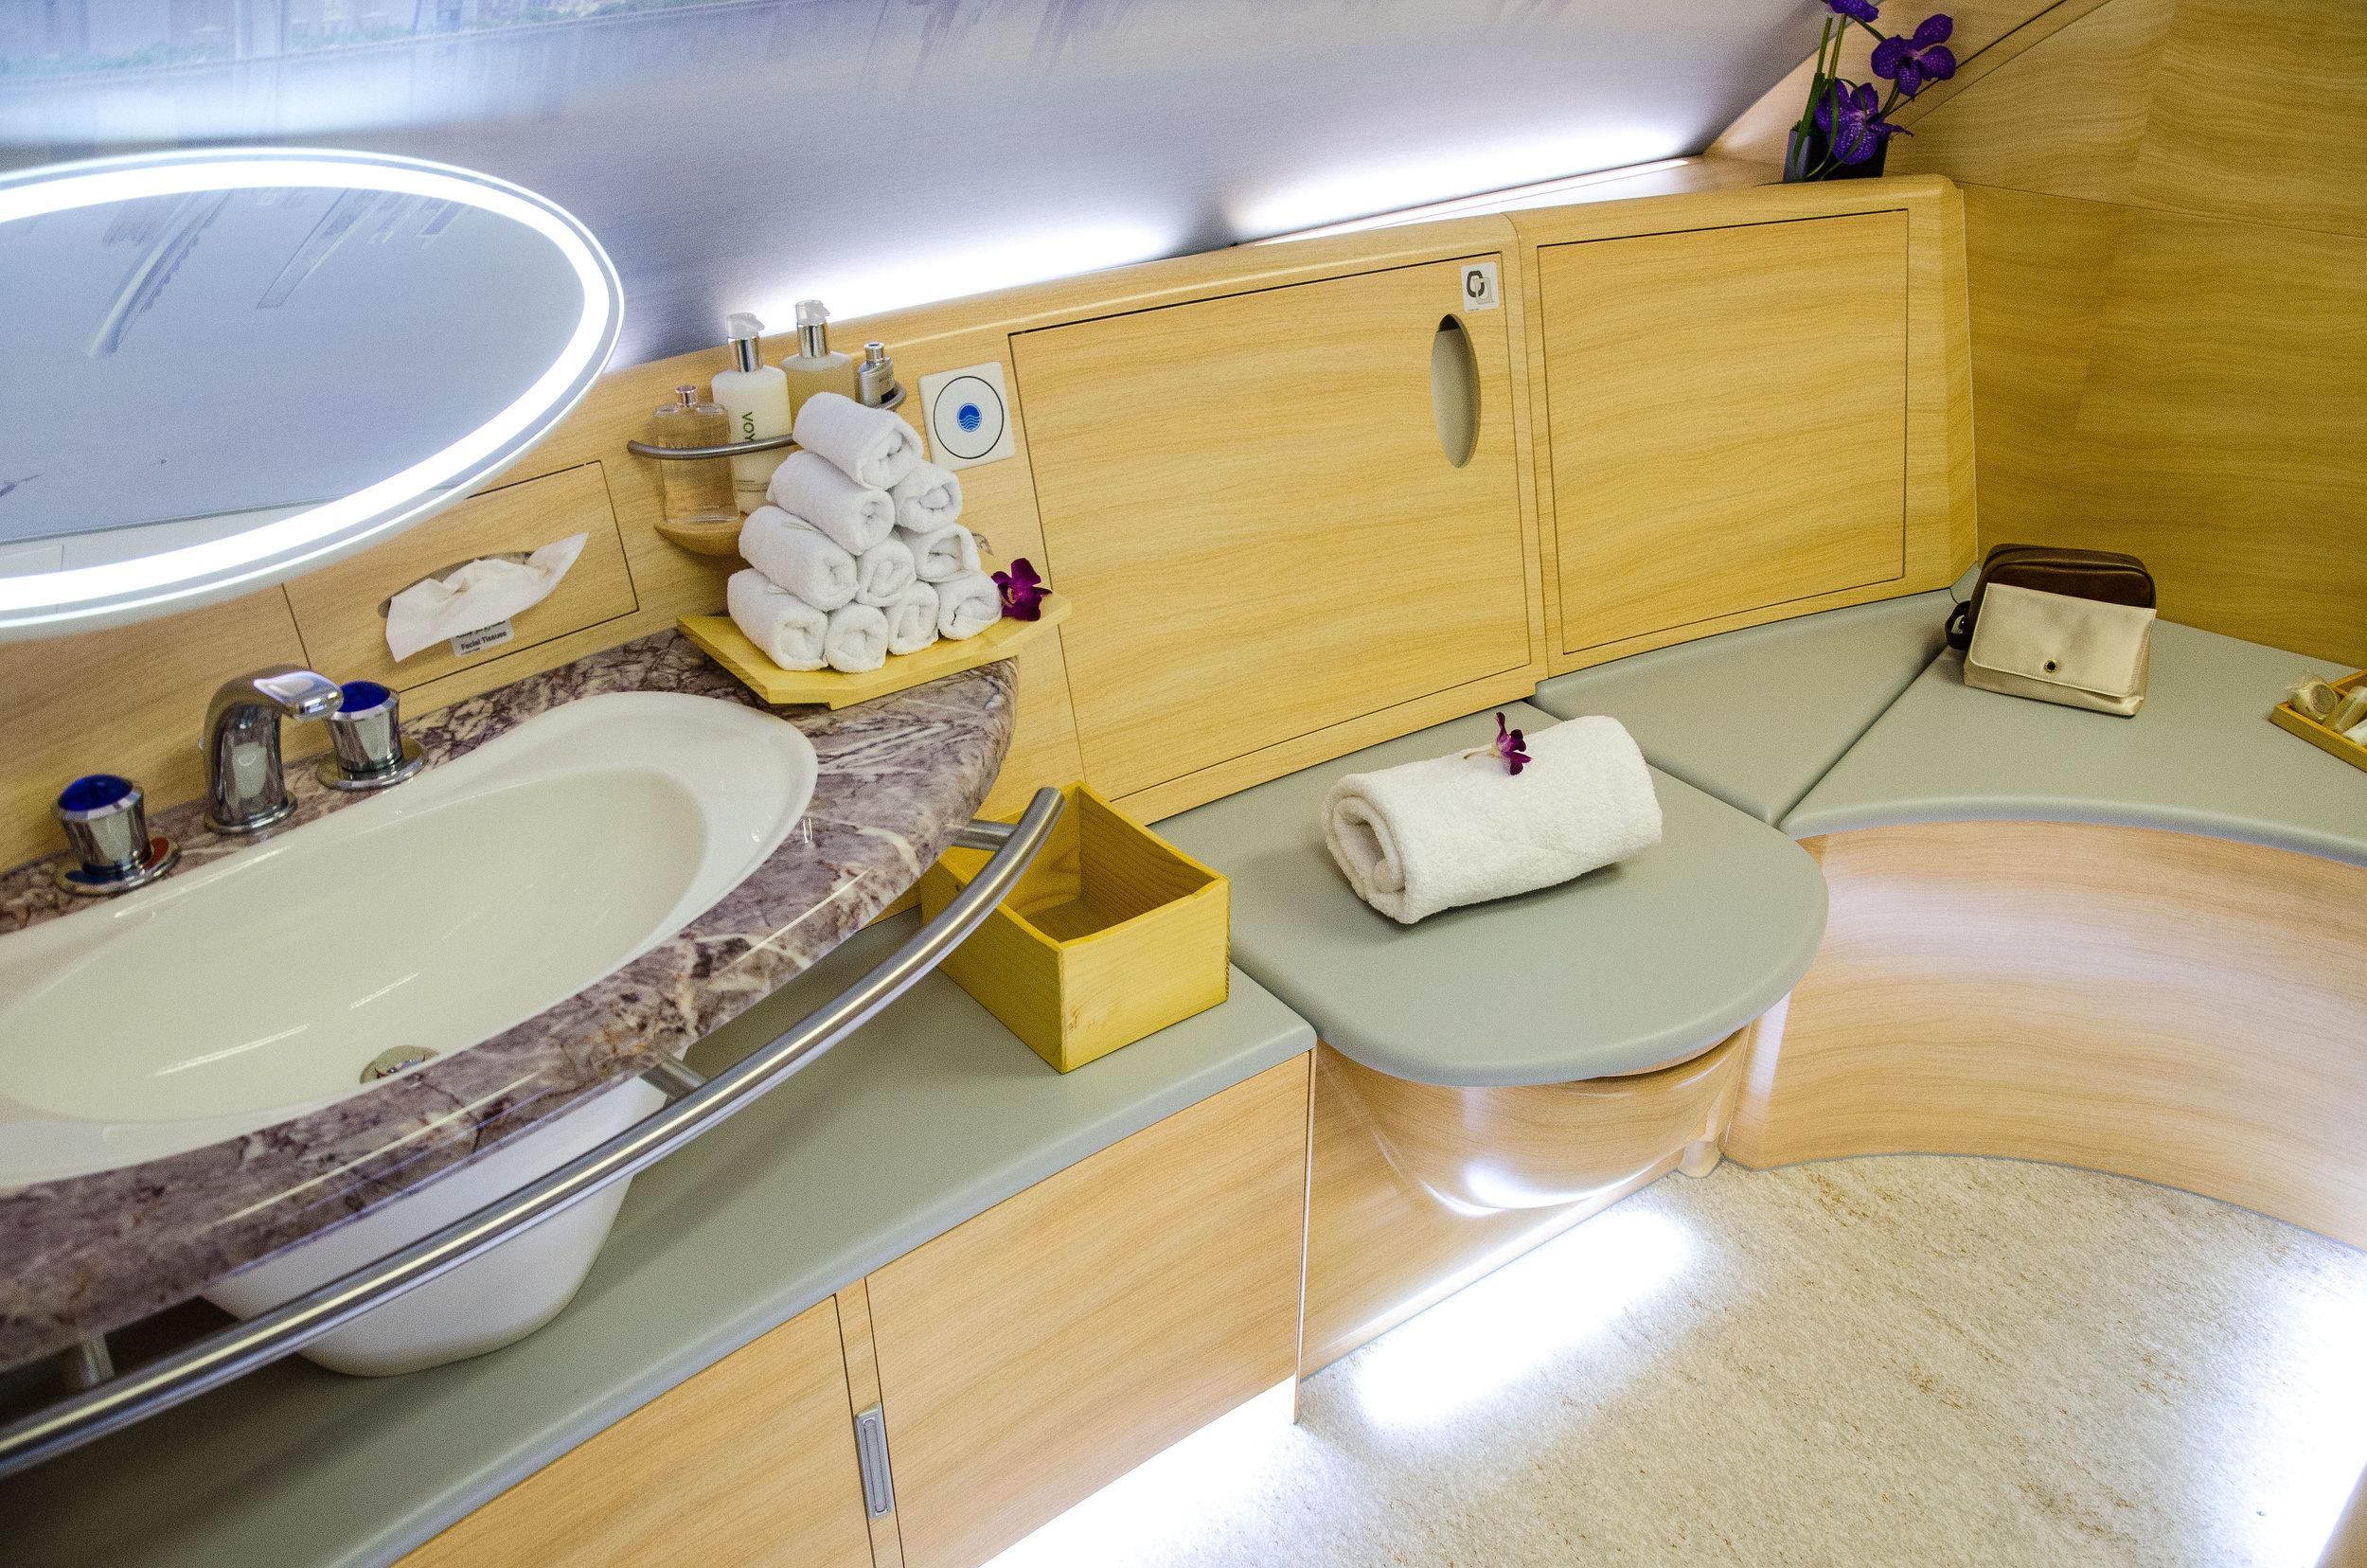 Emirates' First Class bath room